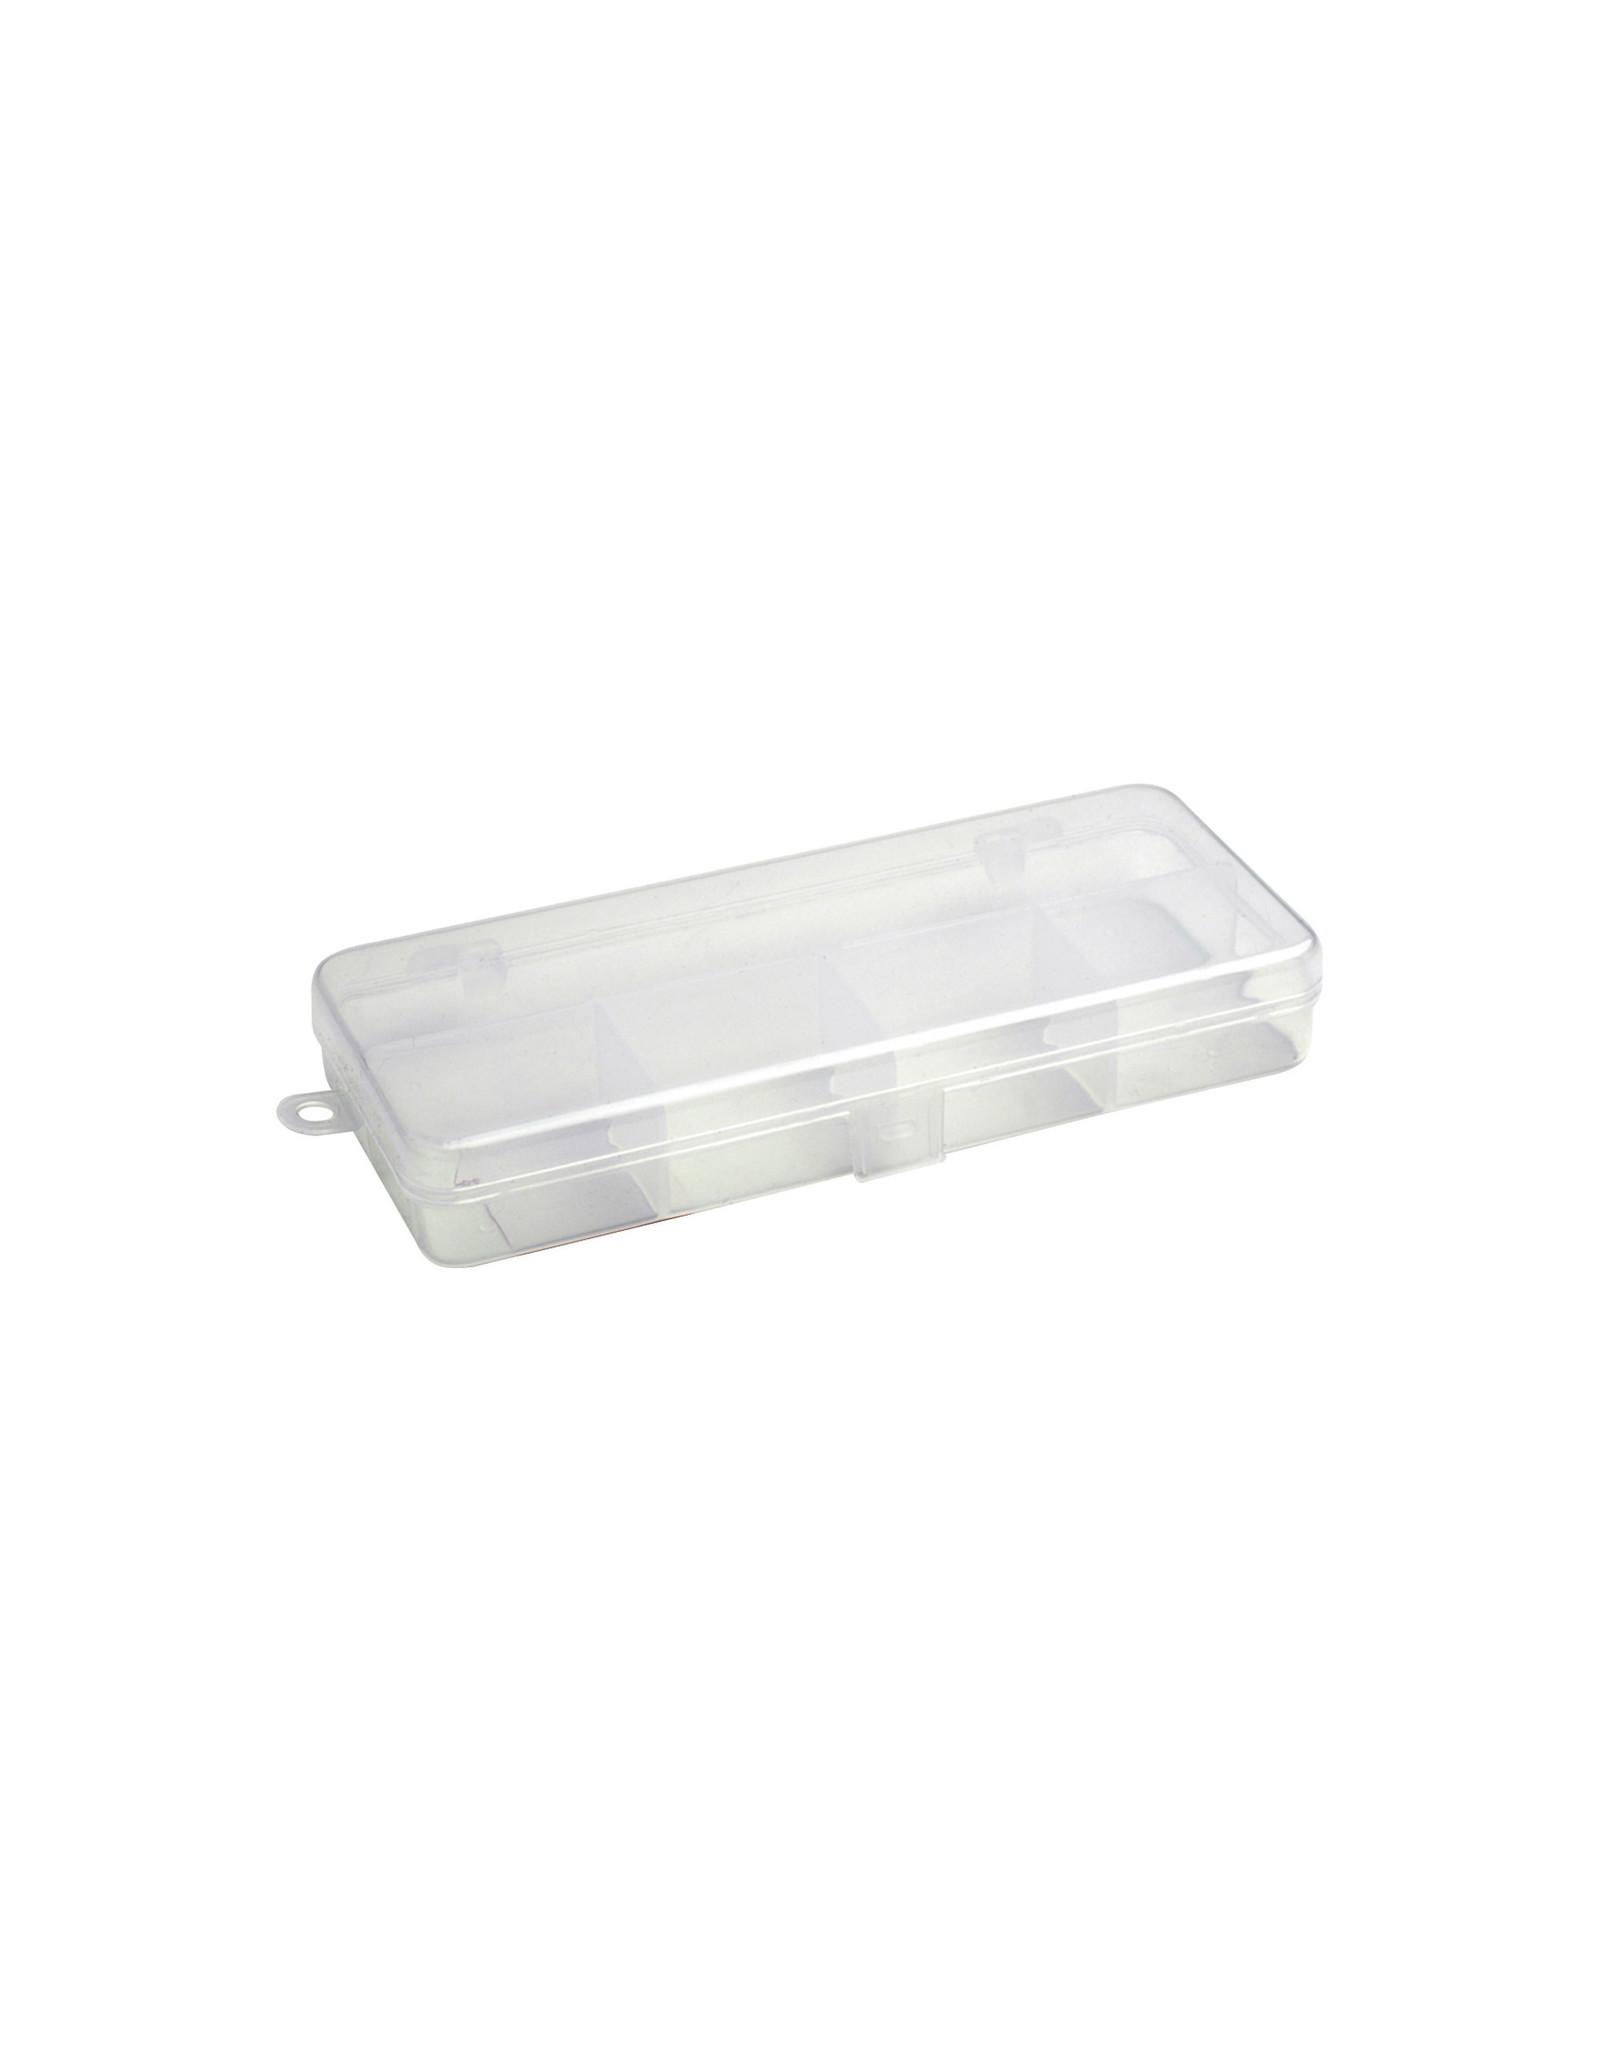 Leeda 5 Compatment Box